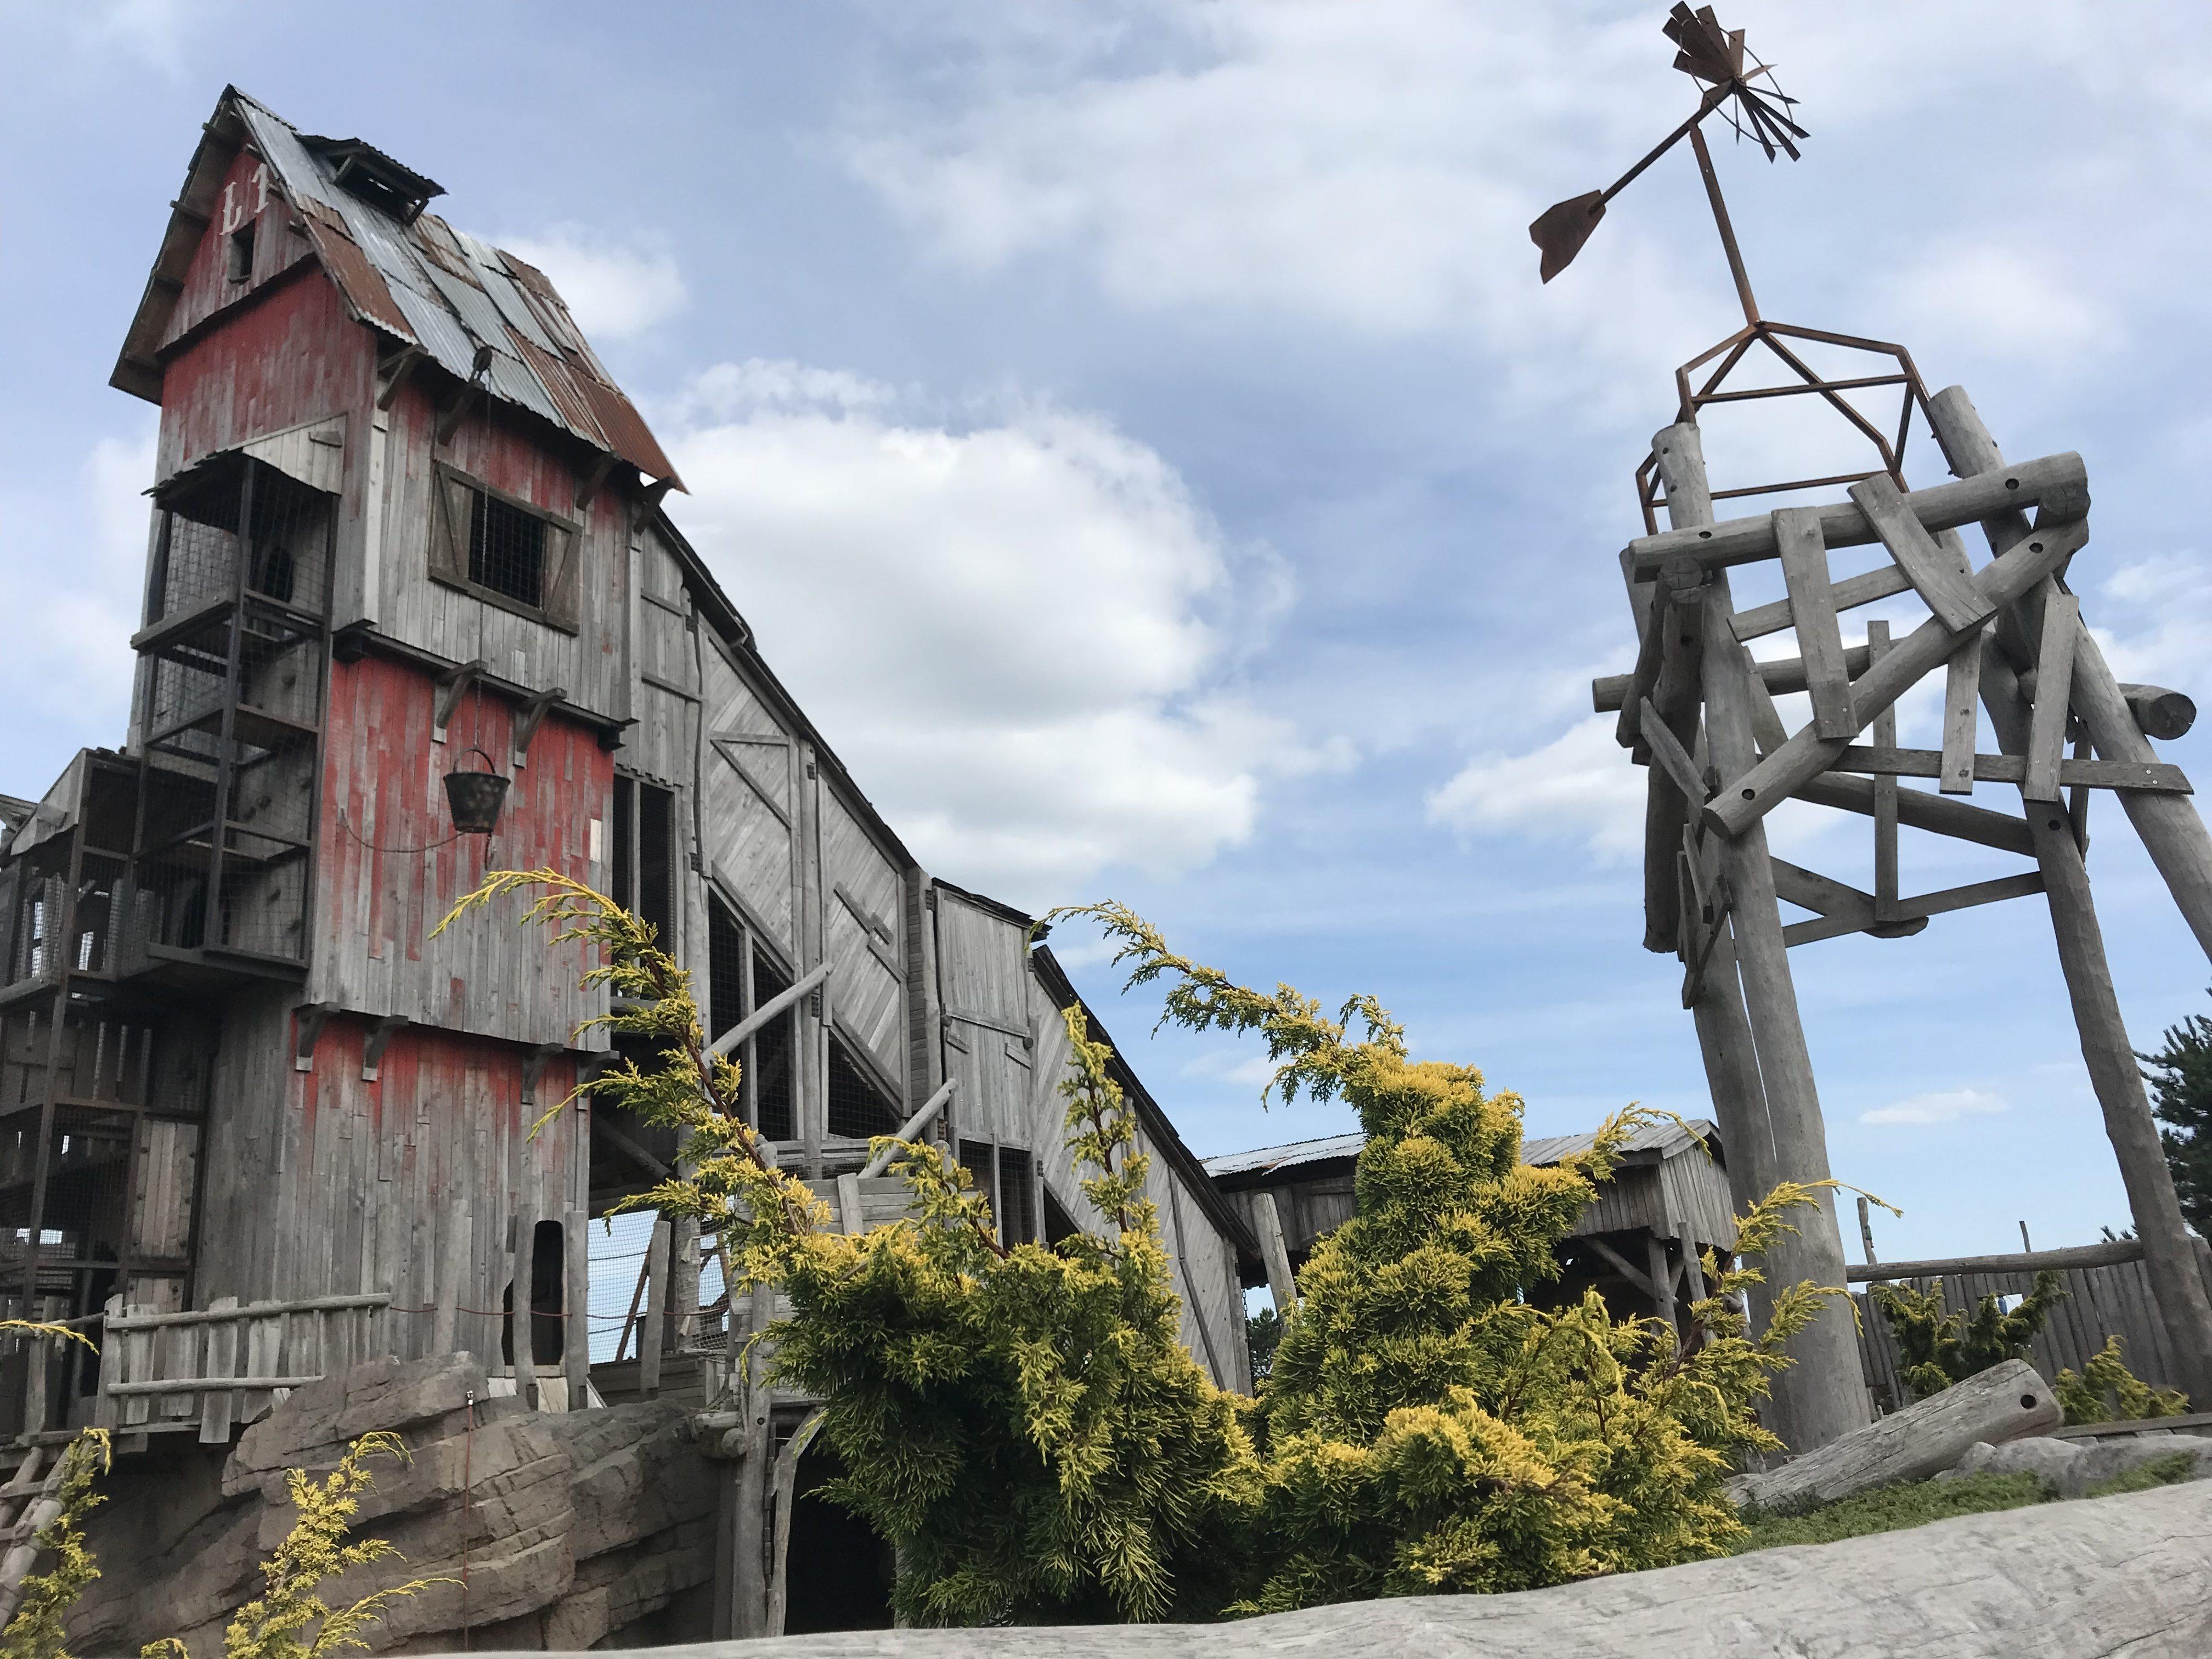 Jaderpark Abenteuerspielplatz